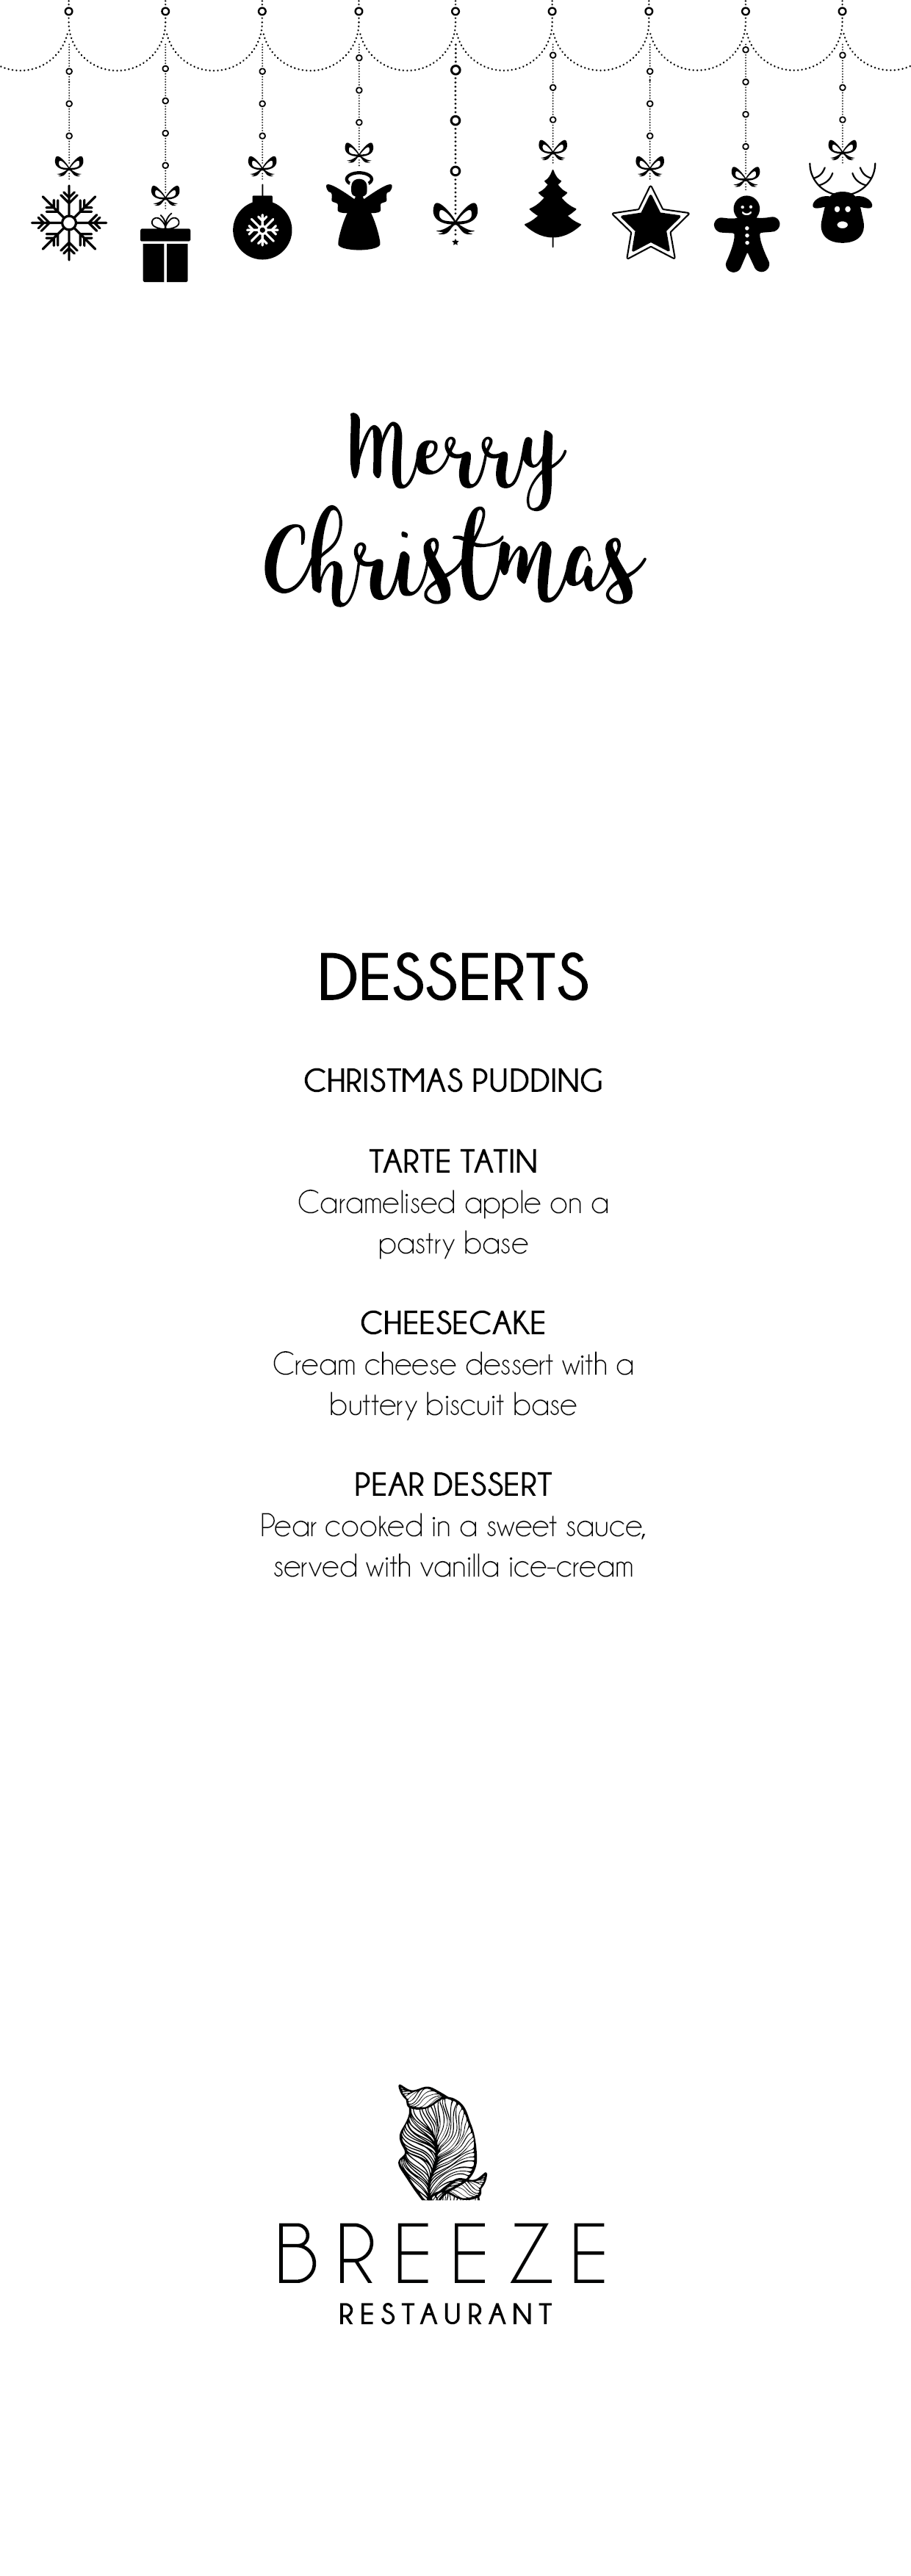 Christmas Set Menu 2018 Desserts